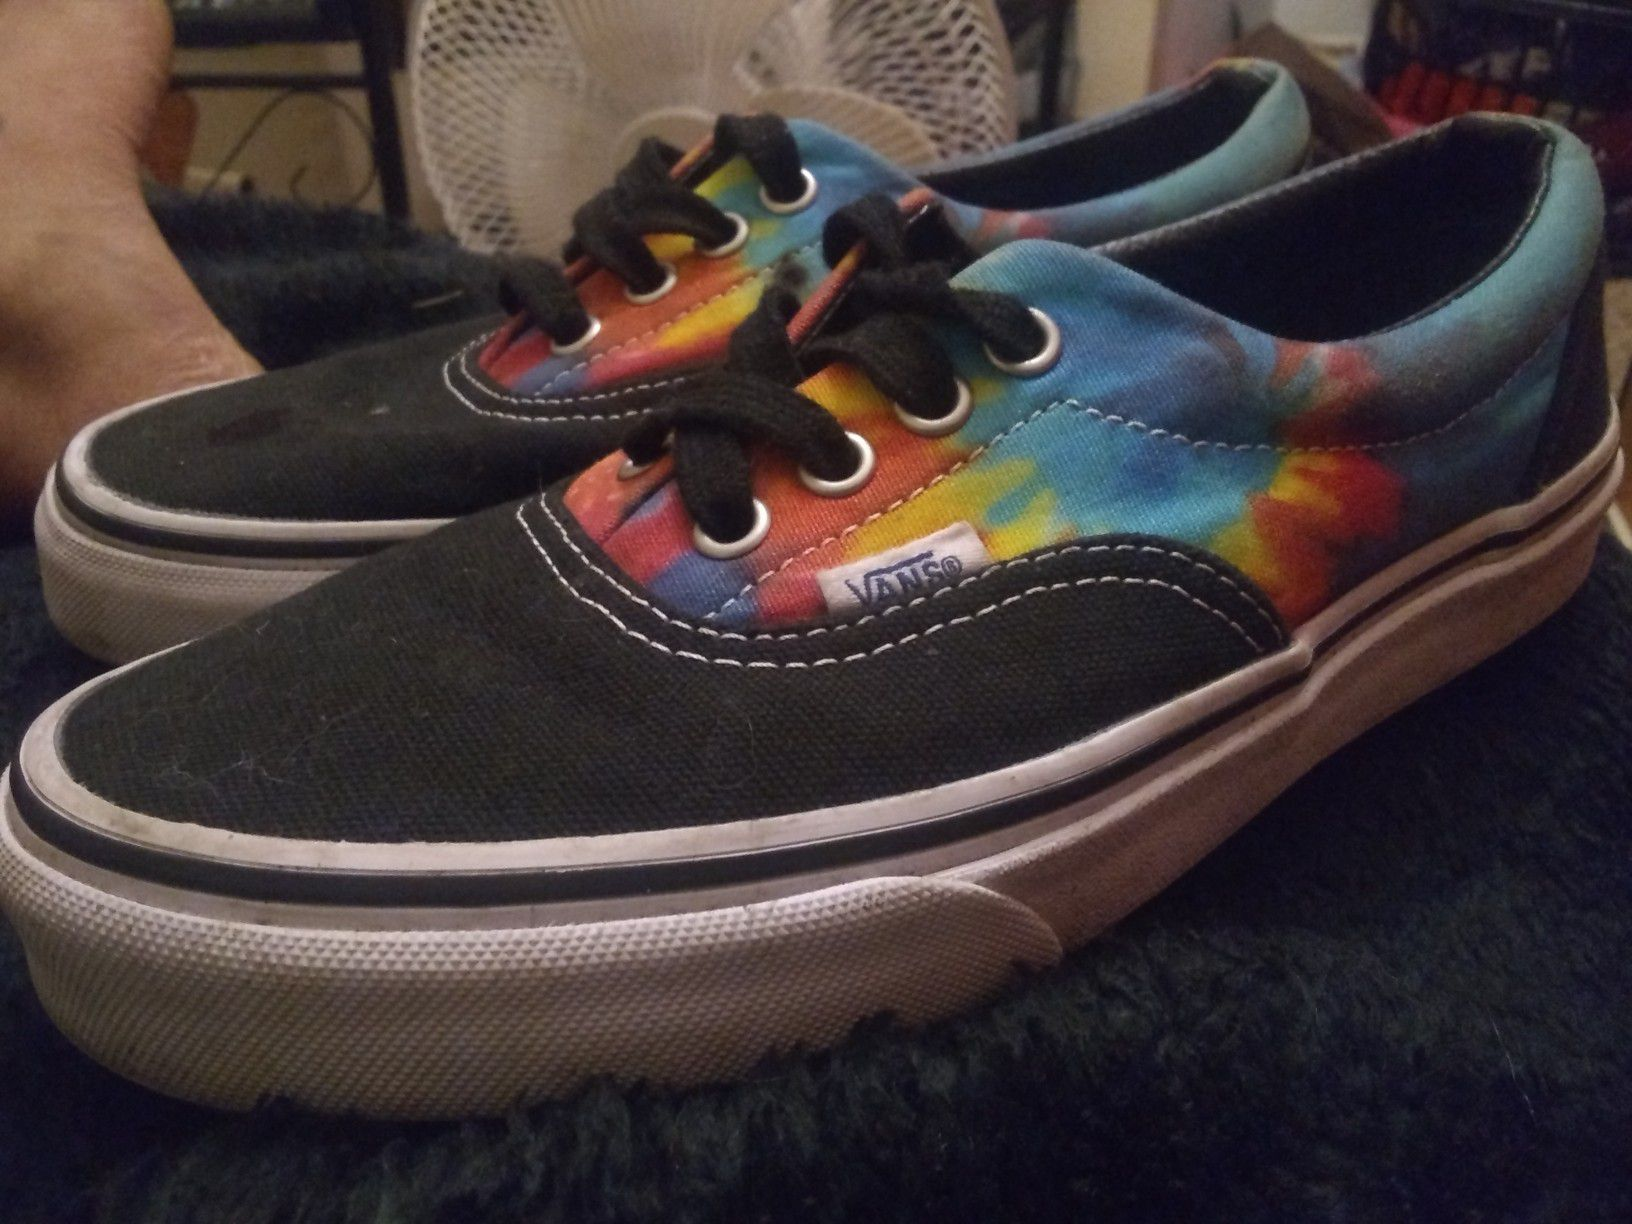 Vans Era Tie Dye Skate Shoes size 5.0 men's